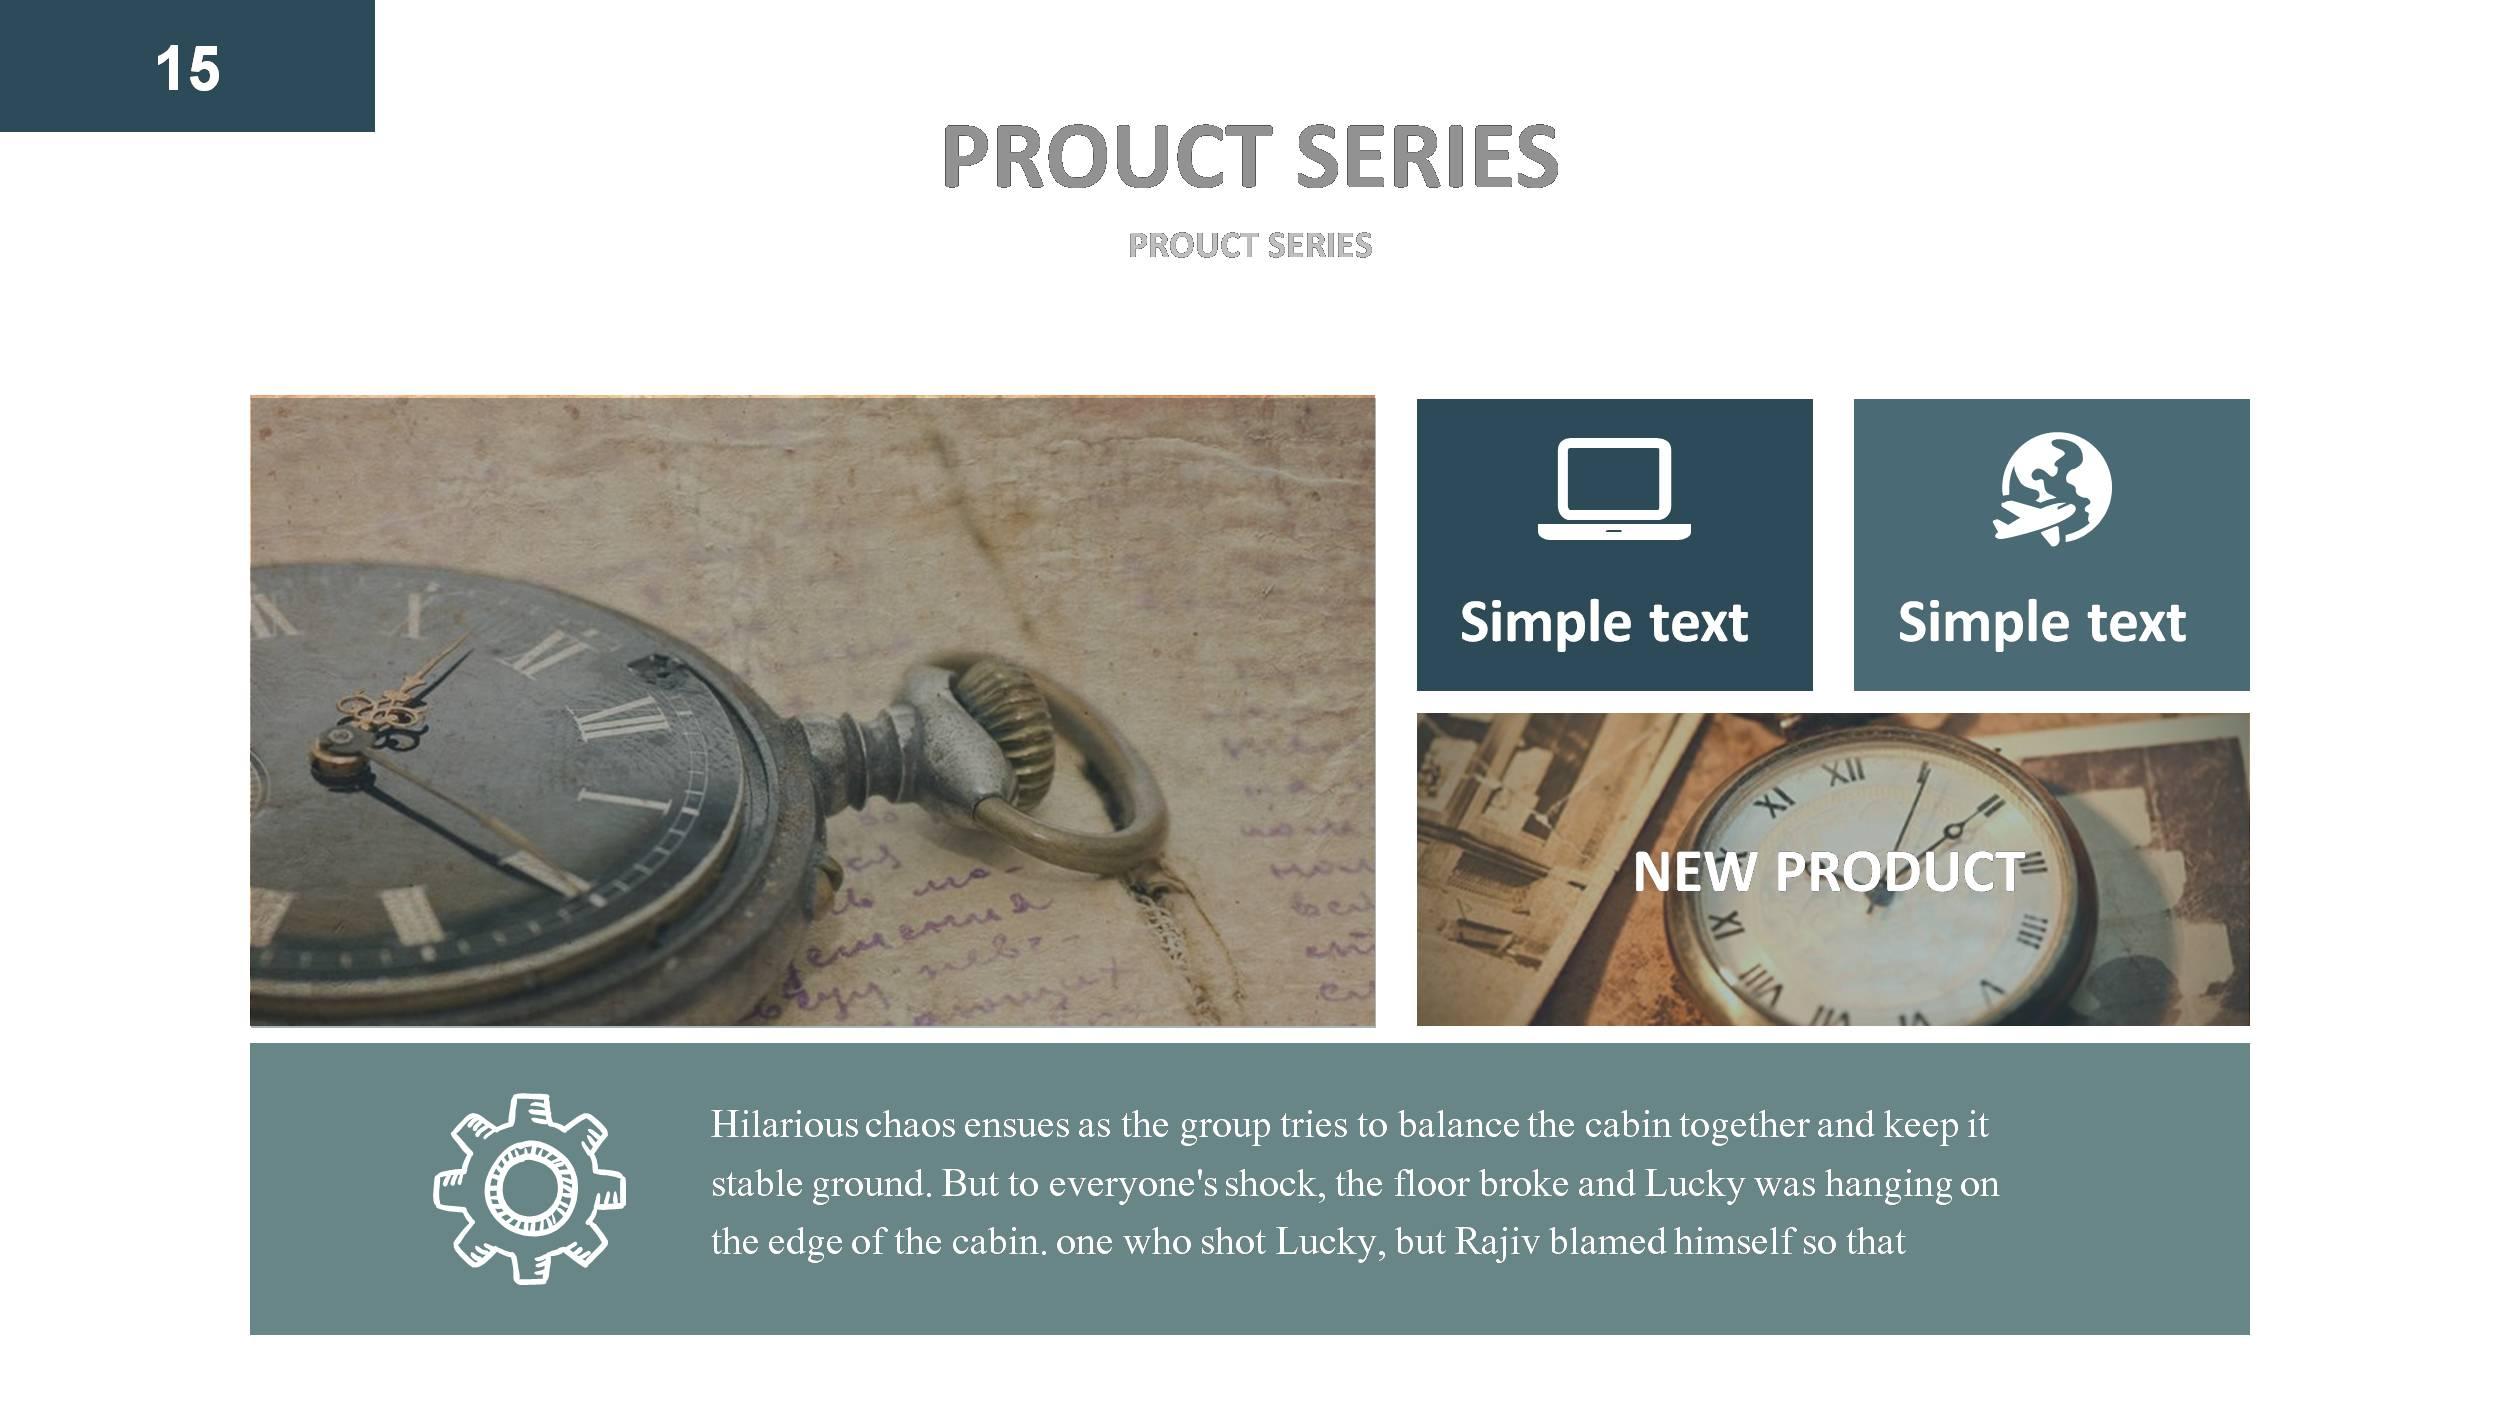 company profile google slides presentation templategardeniadesign, Presentation templates